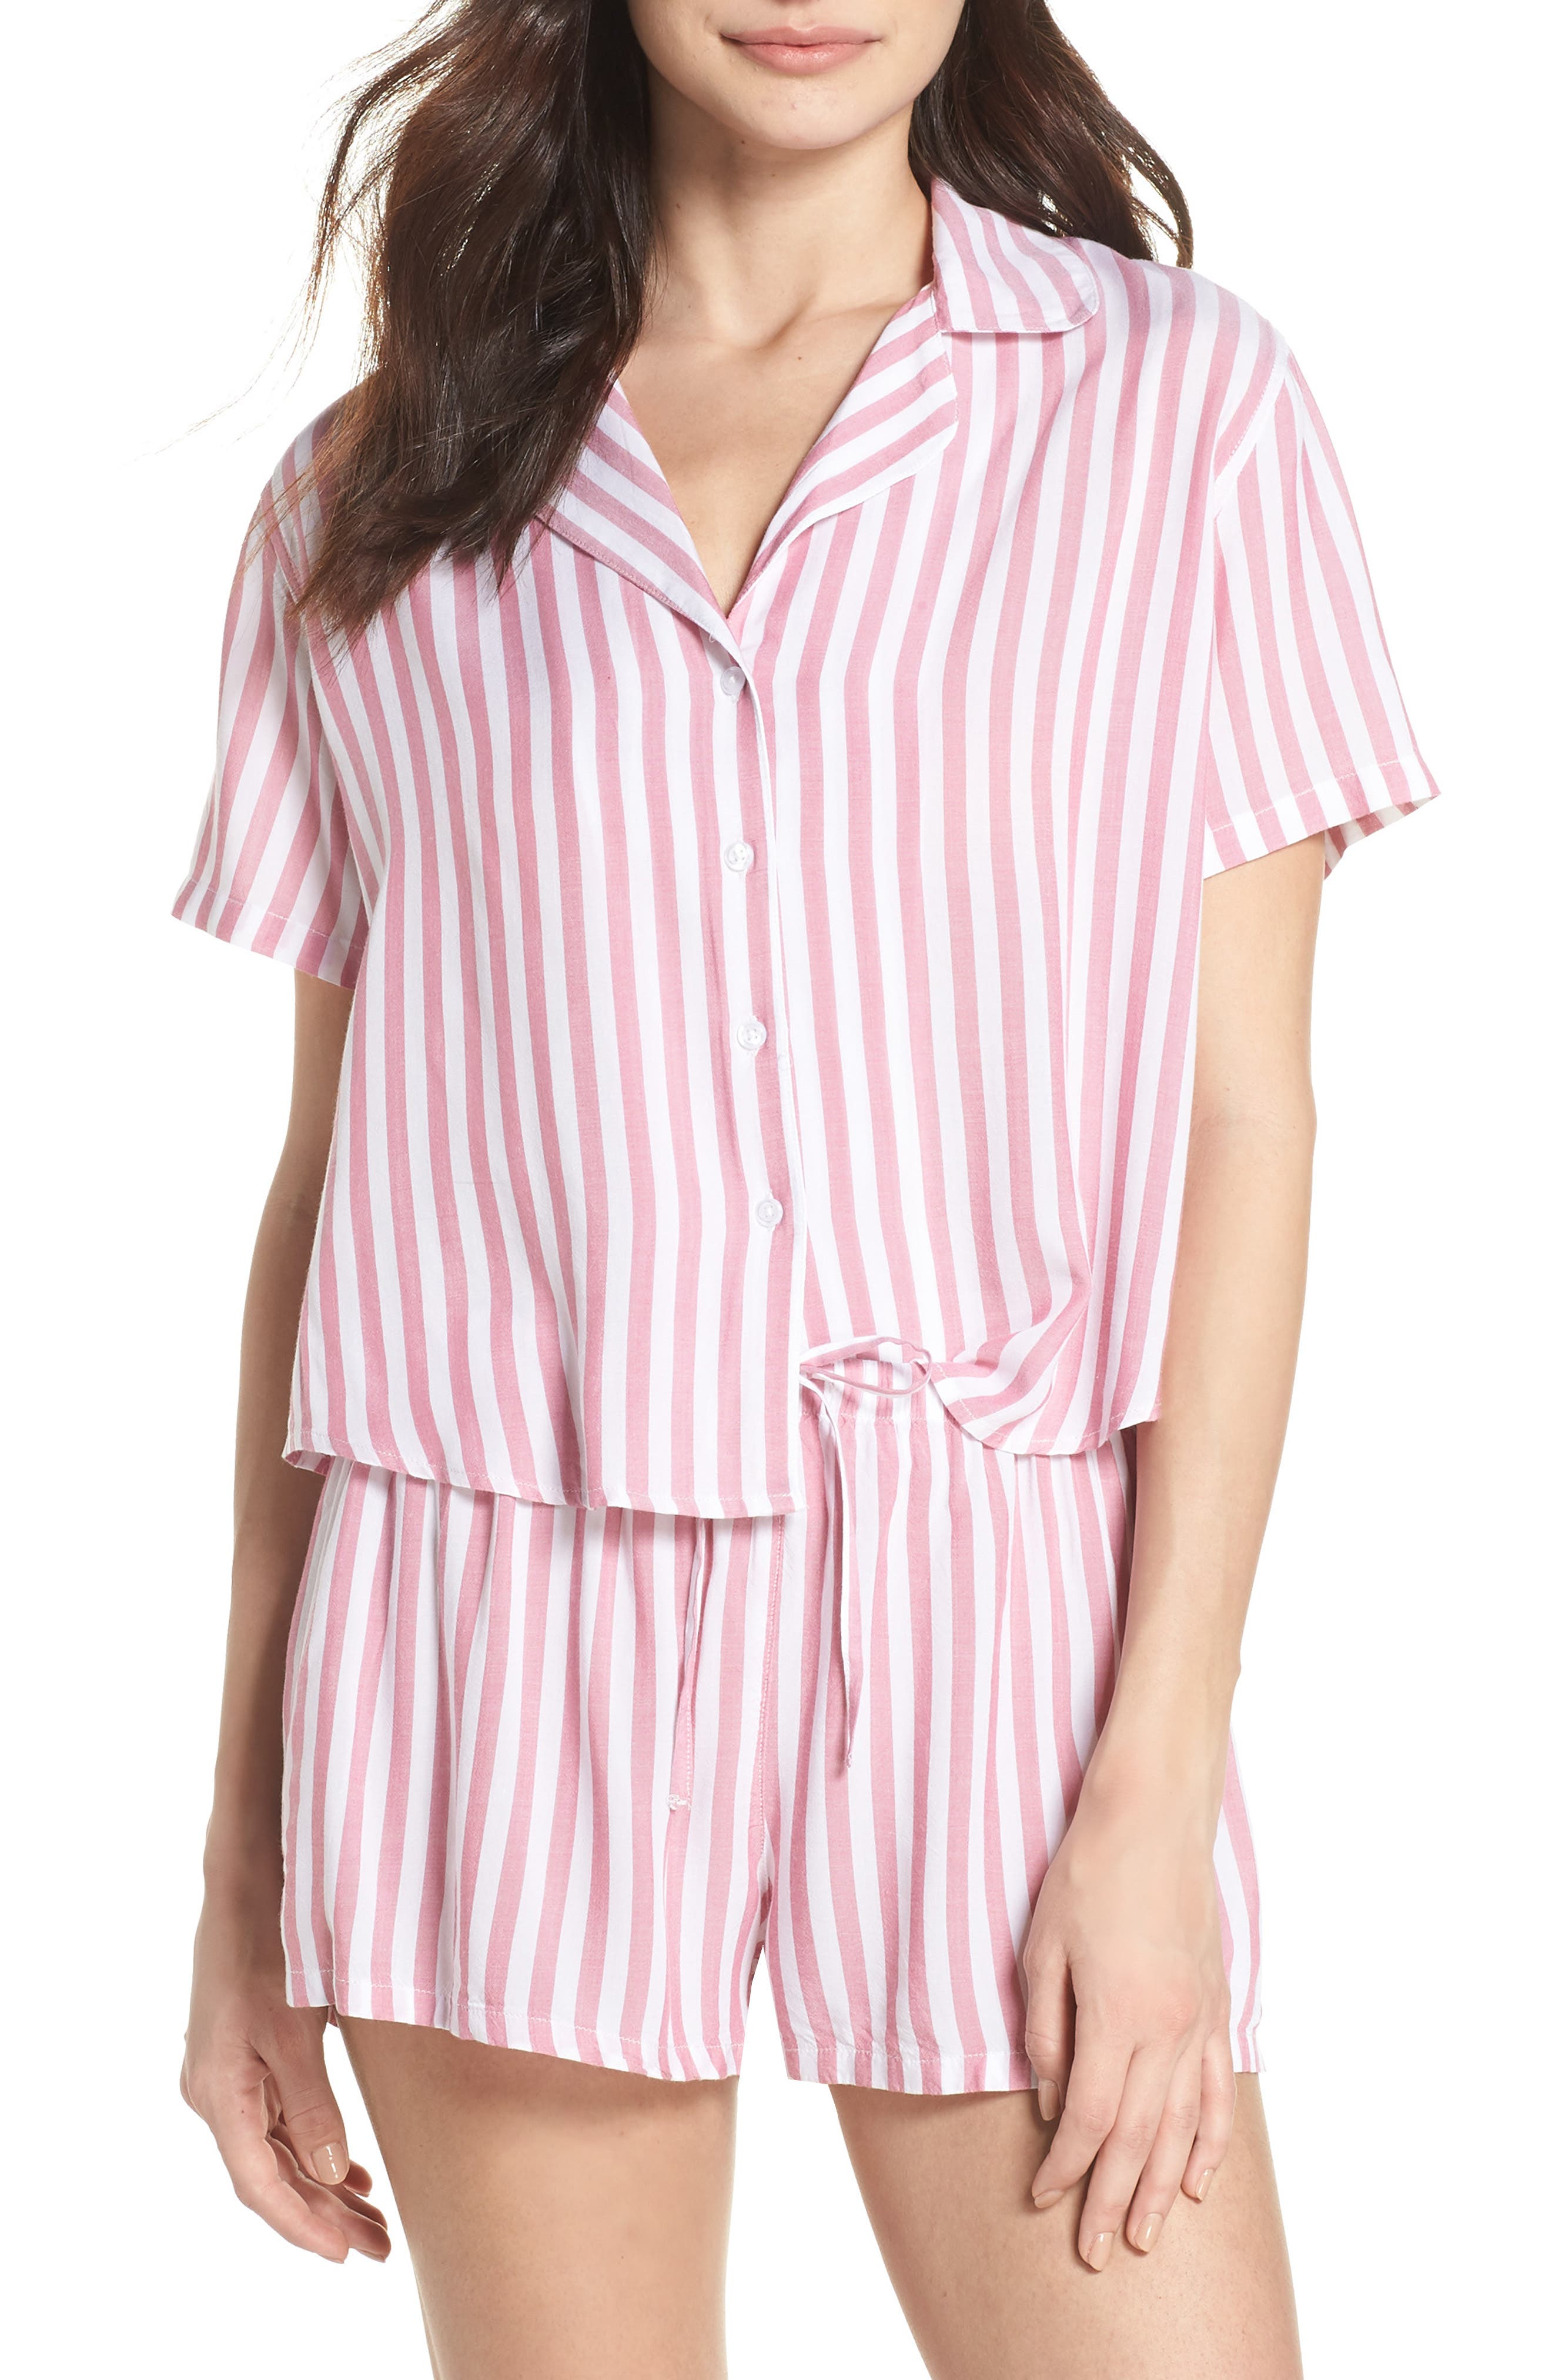 Stripe Short Pajamas,                         Main,                         color, Garnet White